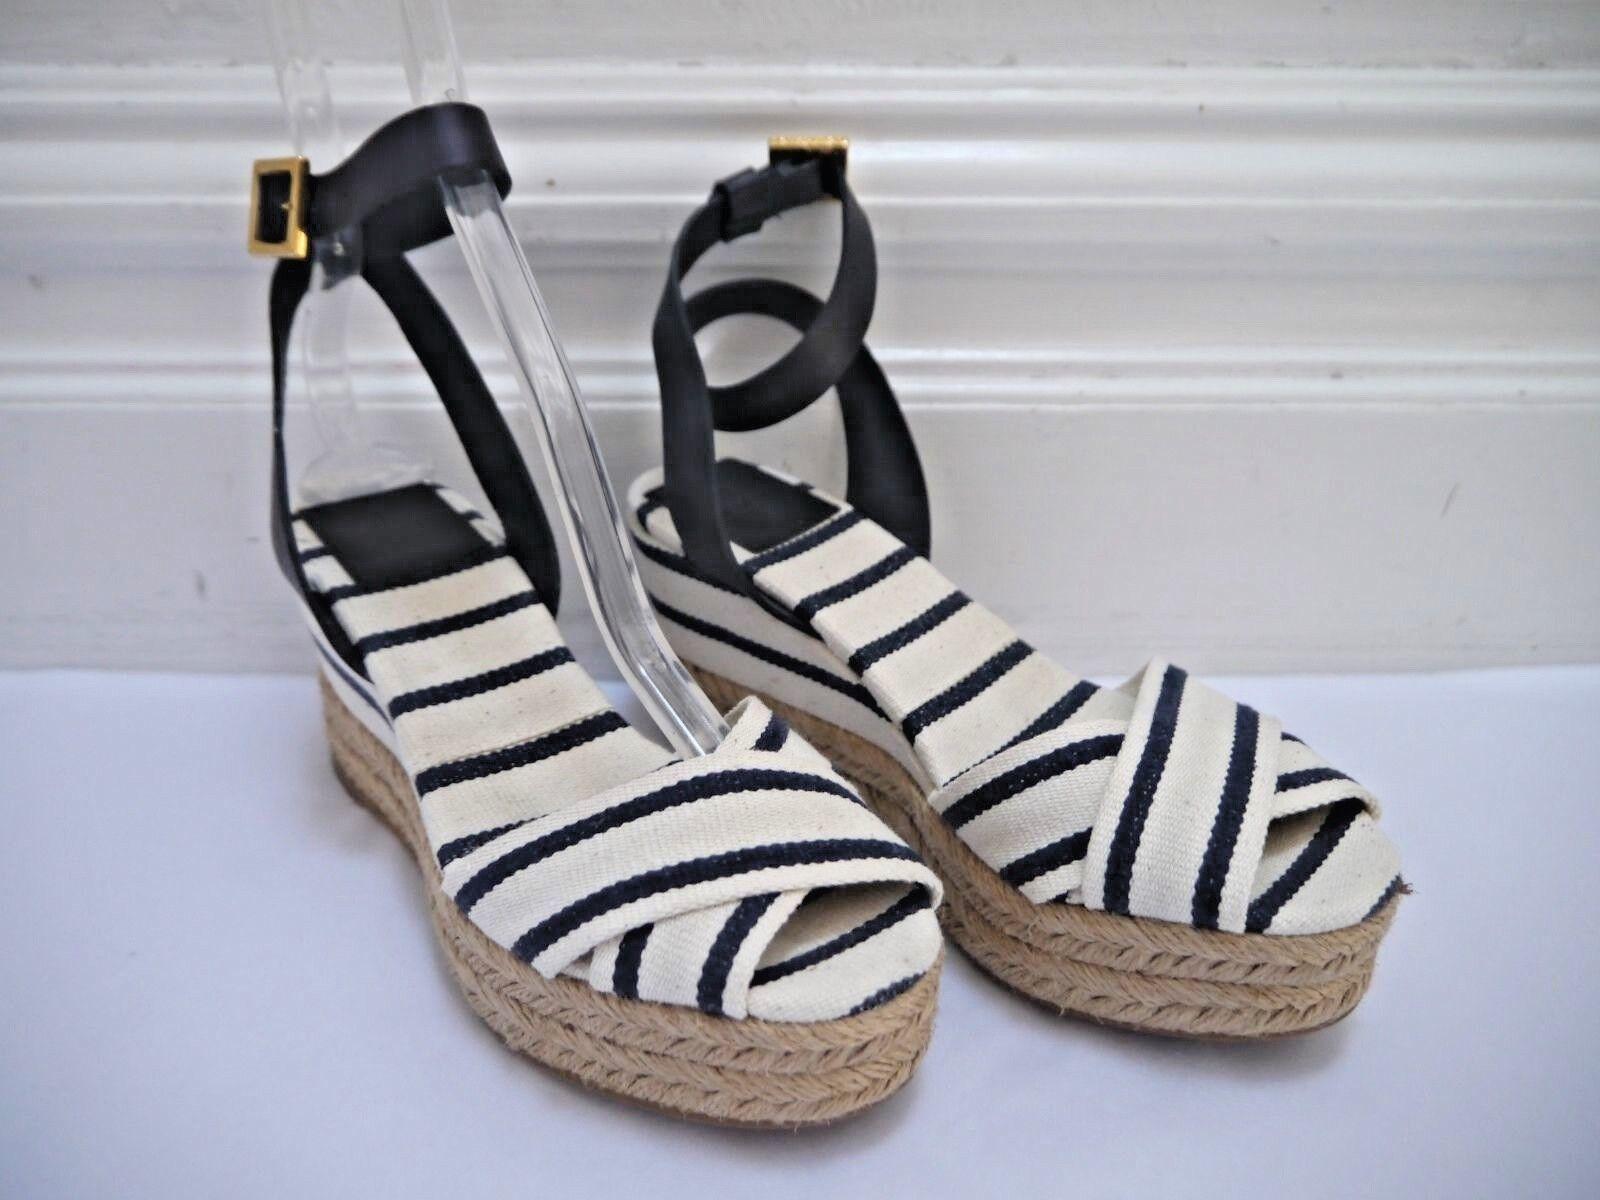 TORY BURCH Karissa canvas striped espadrille wedge sandals size 6 WORN ONCE